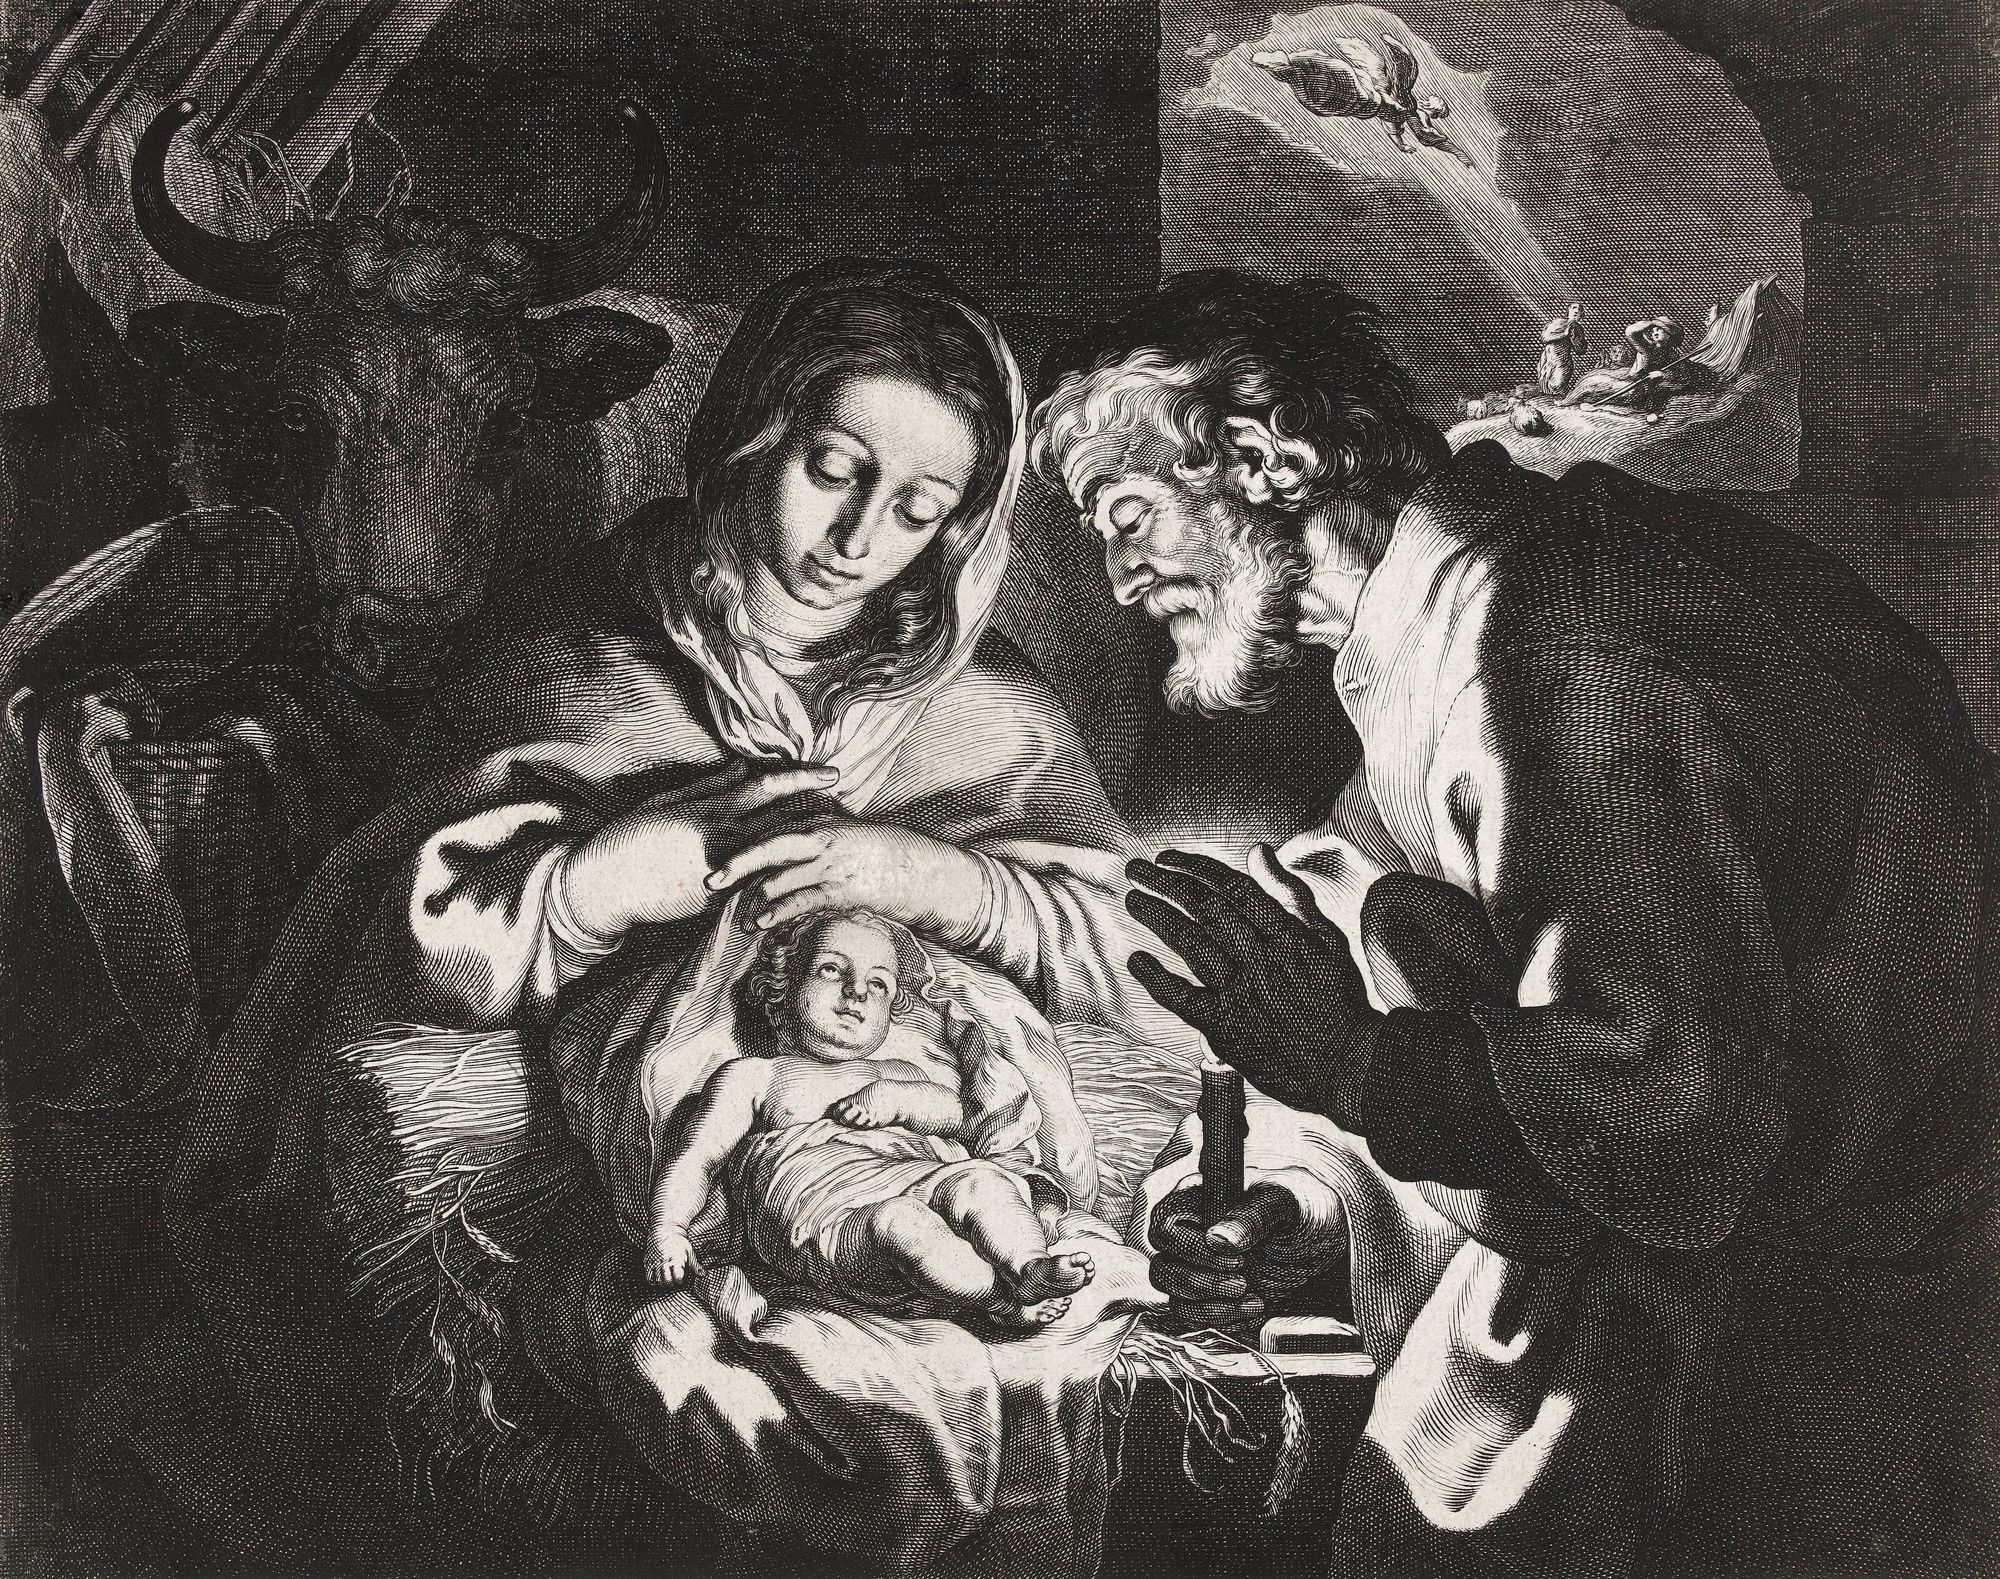 Bloemaert--II---after-Abraham-Bloemaer--1625--2